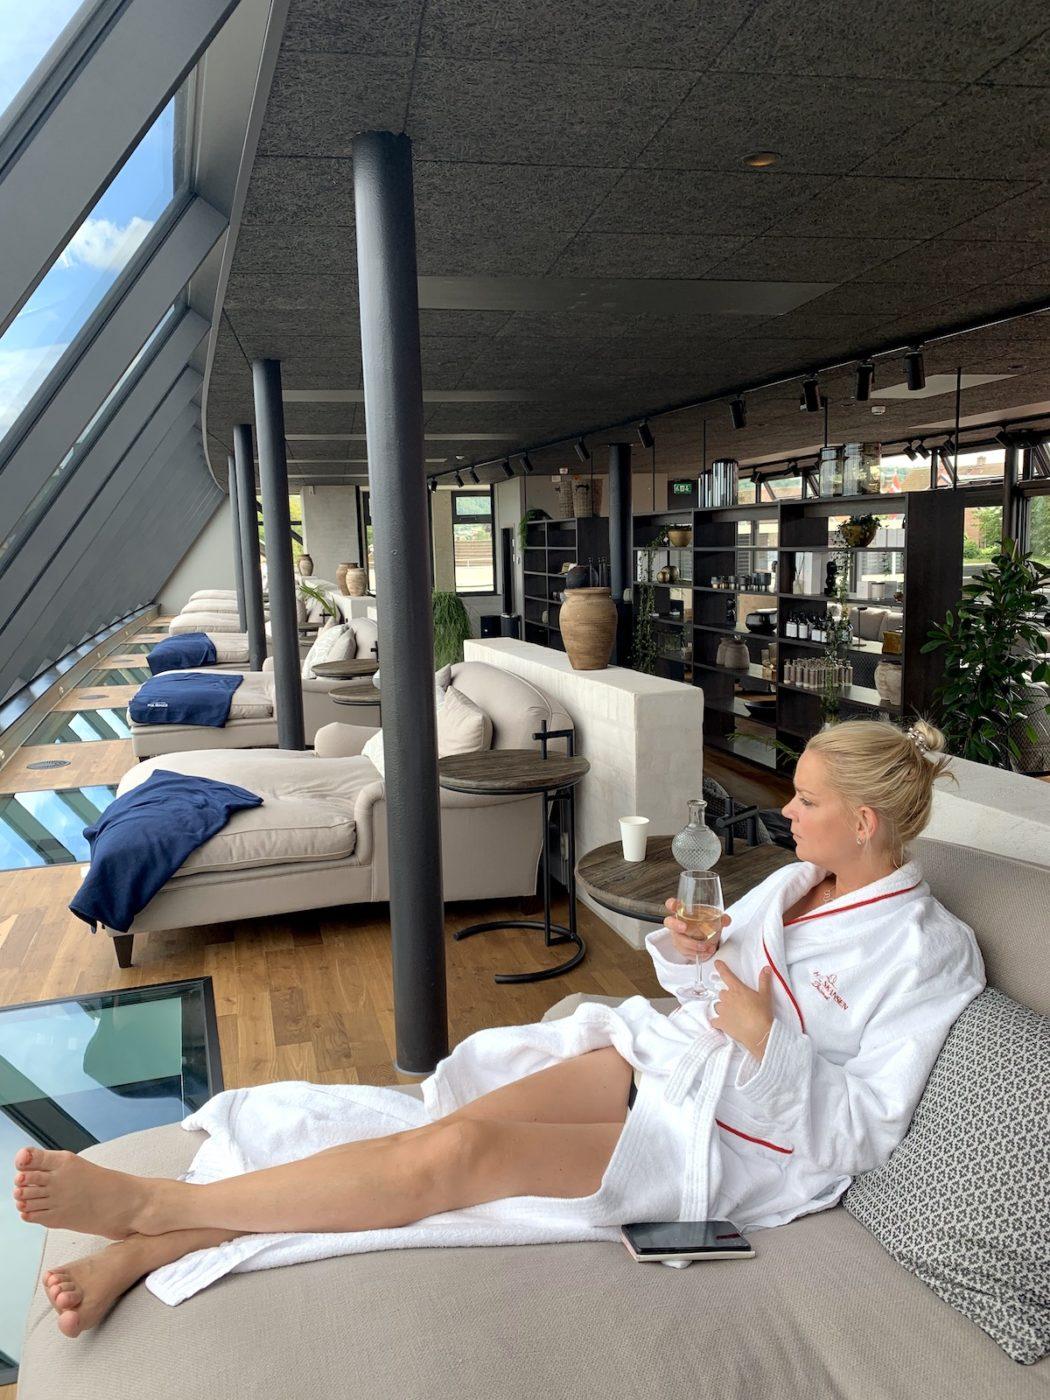 Cissi i loungedelen